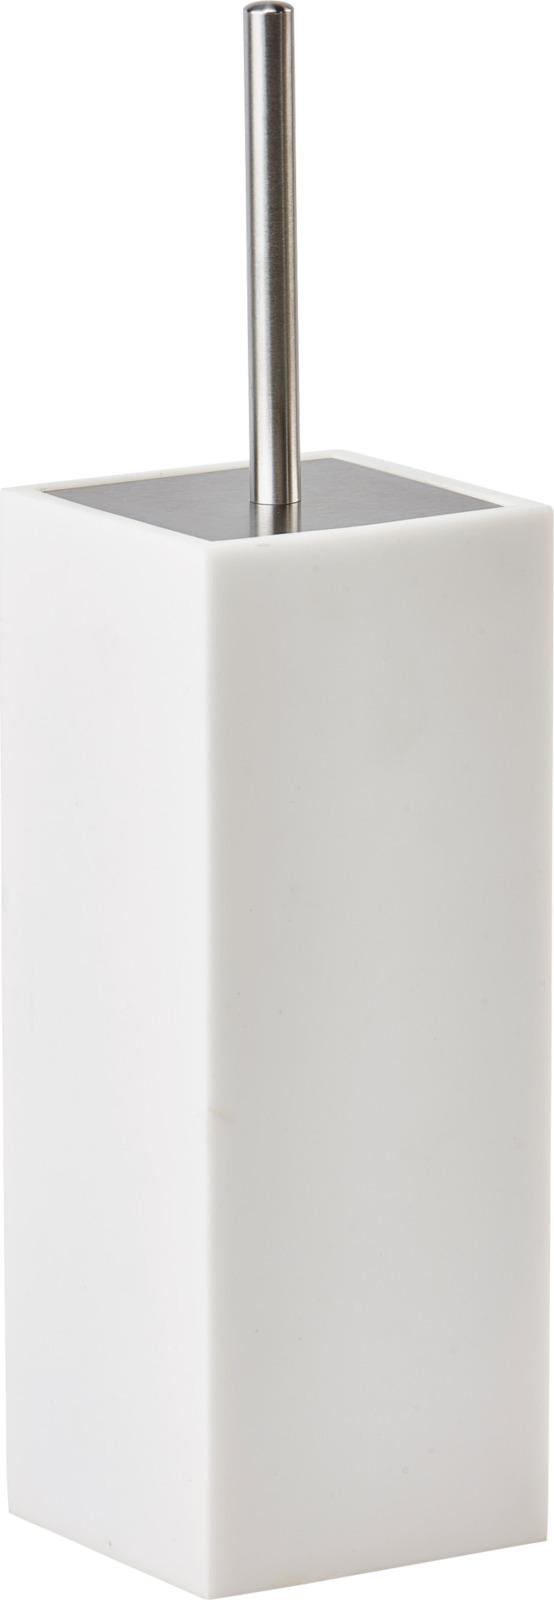 Ершик для ванной комнаты MOON